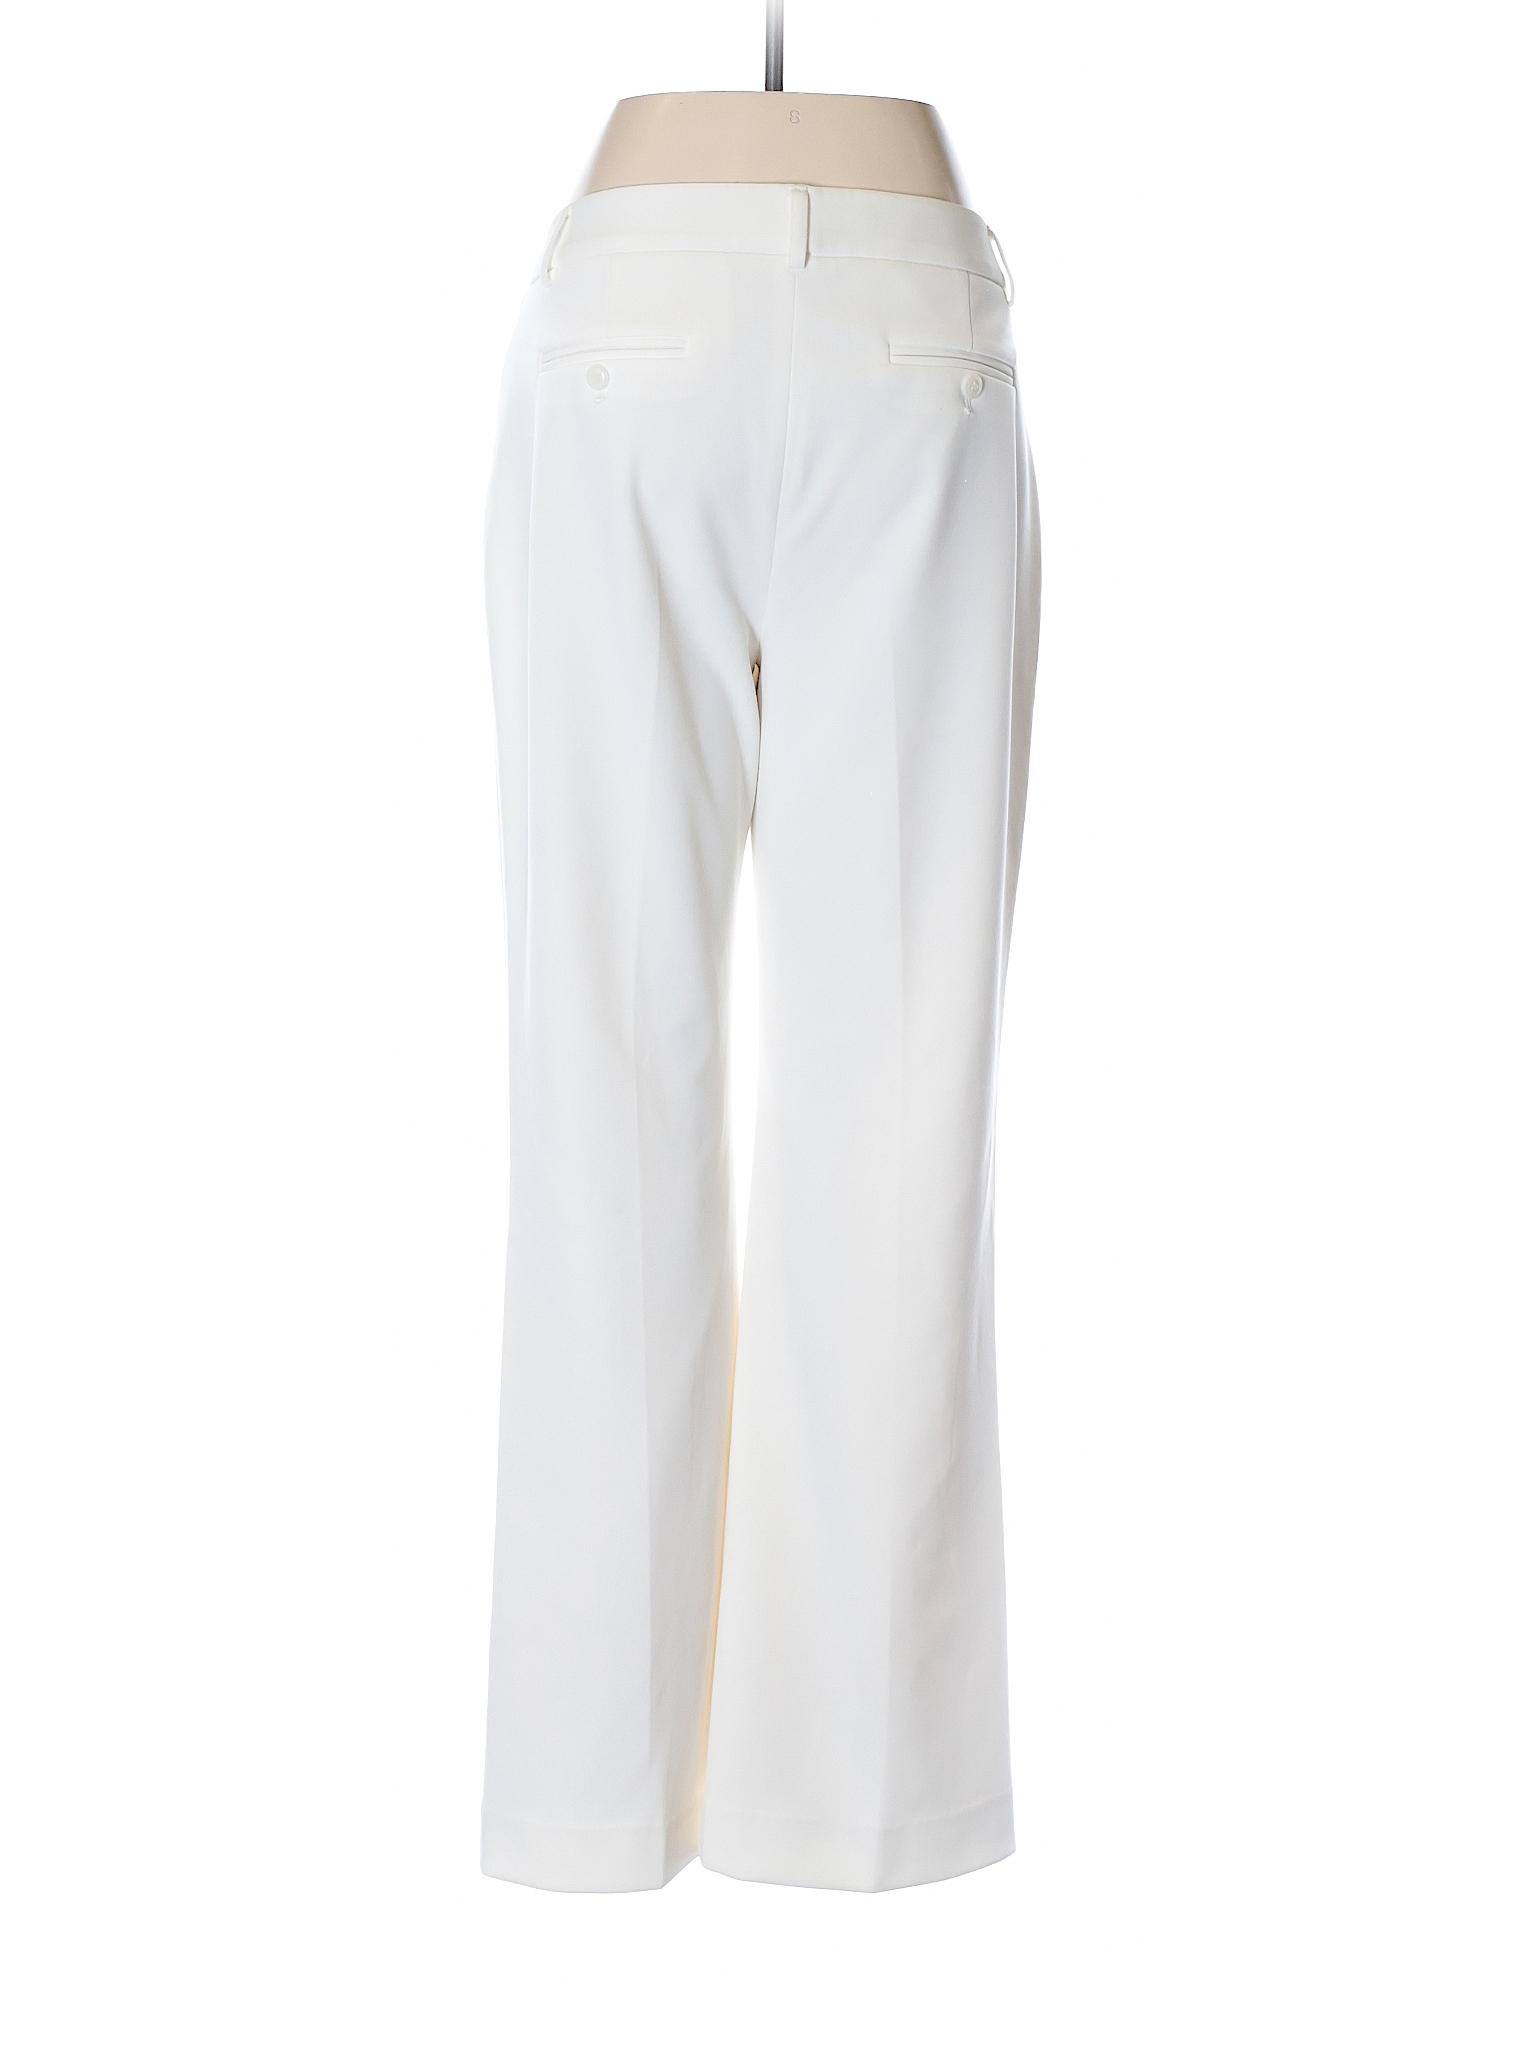 III Boutique leisure Pants Bar Dress HWWOrS